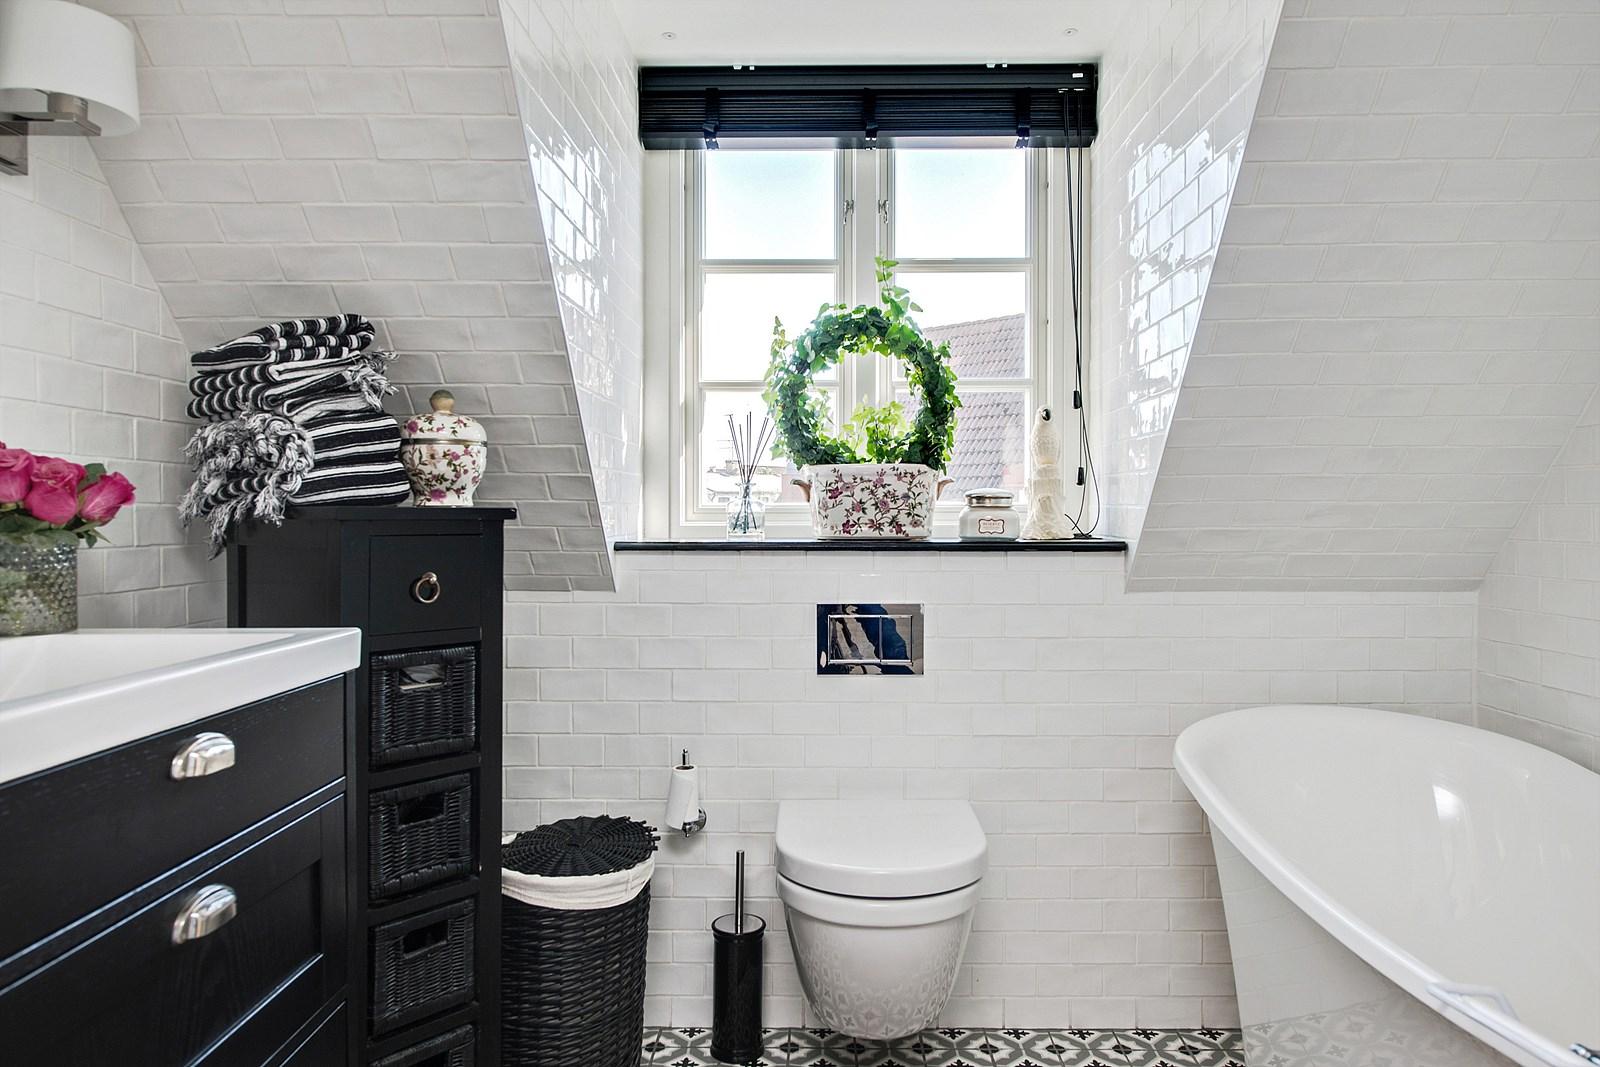 мансарда санузел ванная комната окно ванна раковина комод